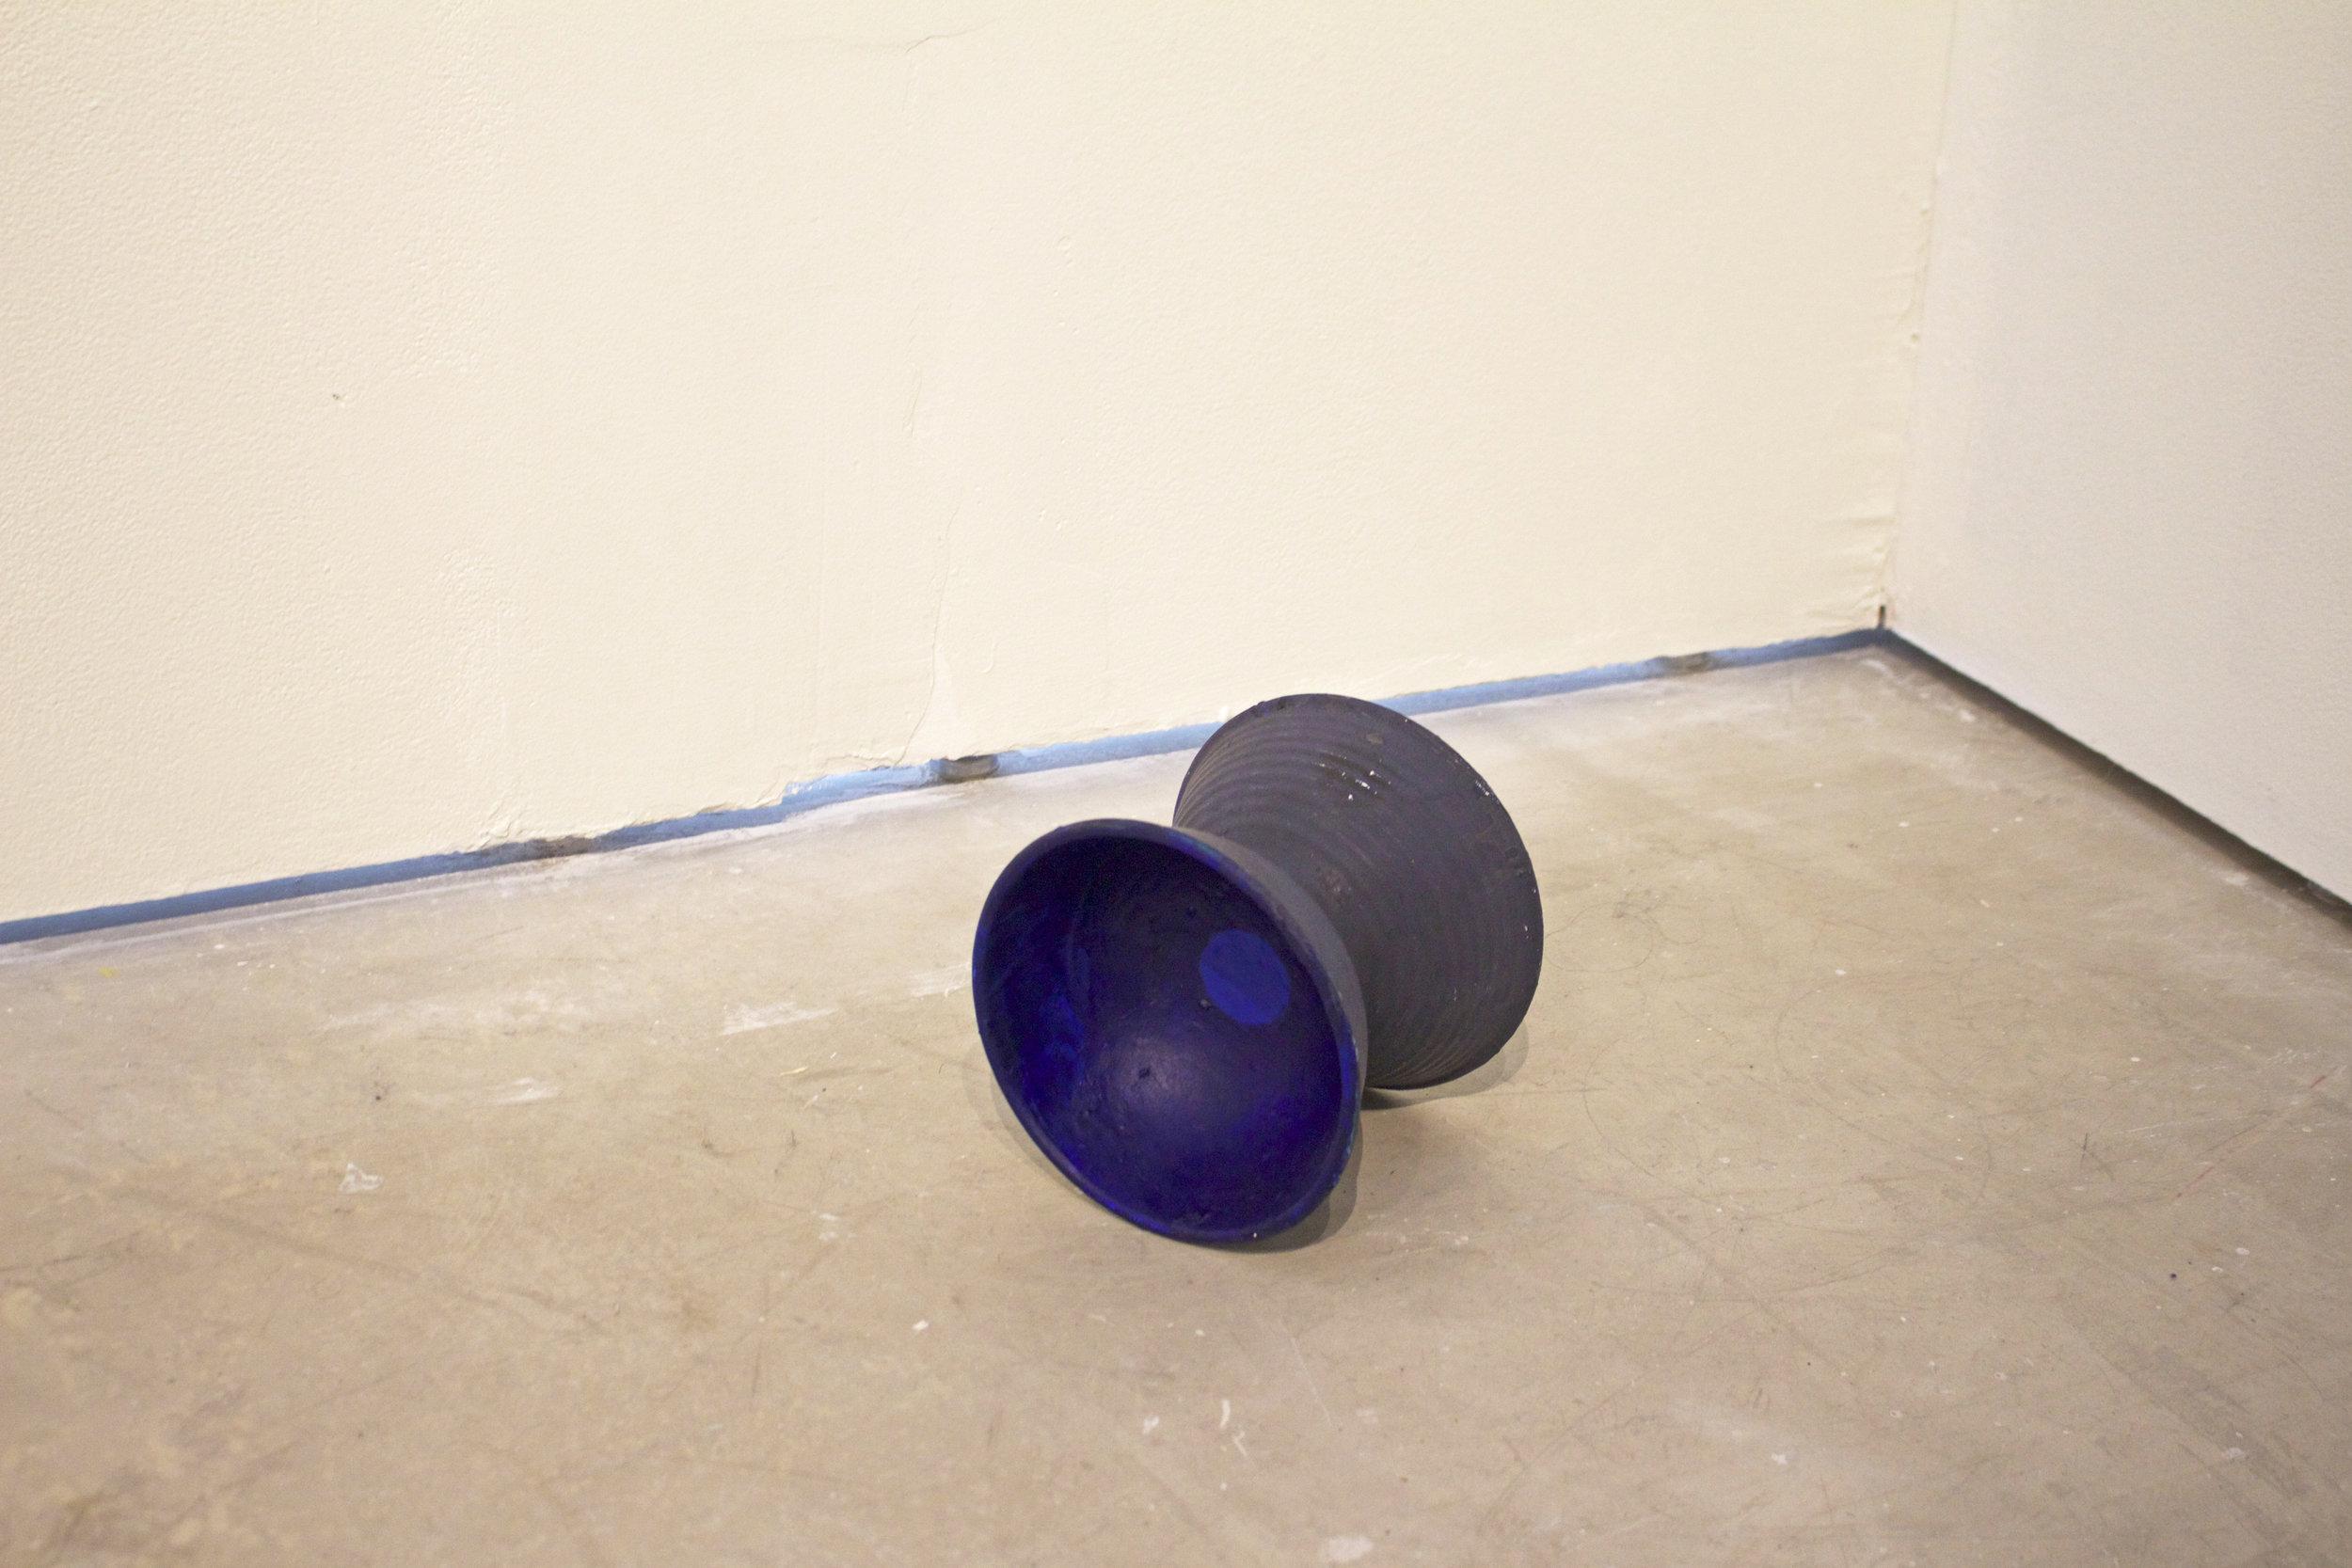 Grecian Dog Bowl   ,  2015  acrylic and casein on plastic bowls, glue